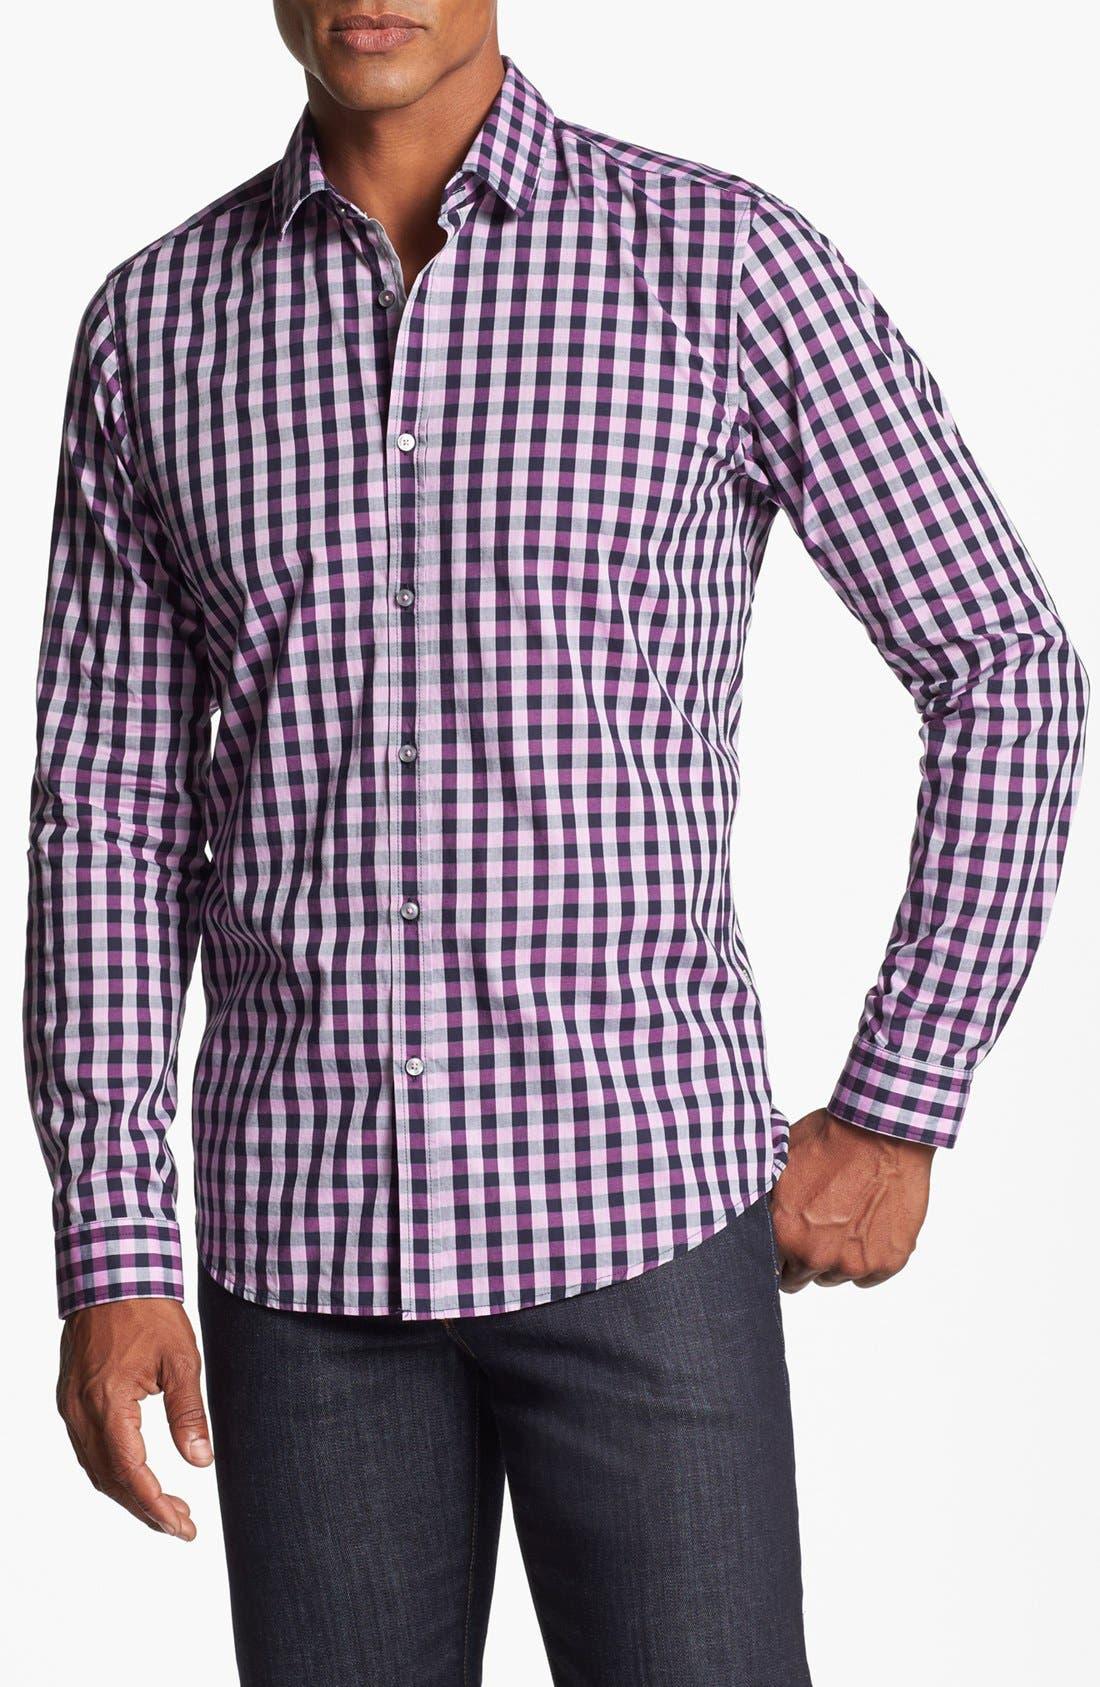 Alternate Image 1 Selected - BOSS HUGO BOSS 'Lorenzo' Regular Fit Sport Shirt